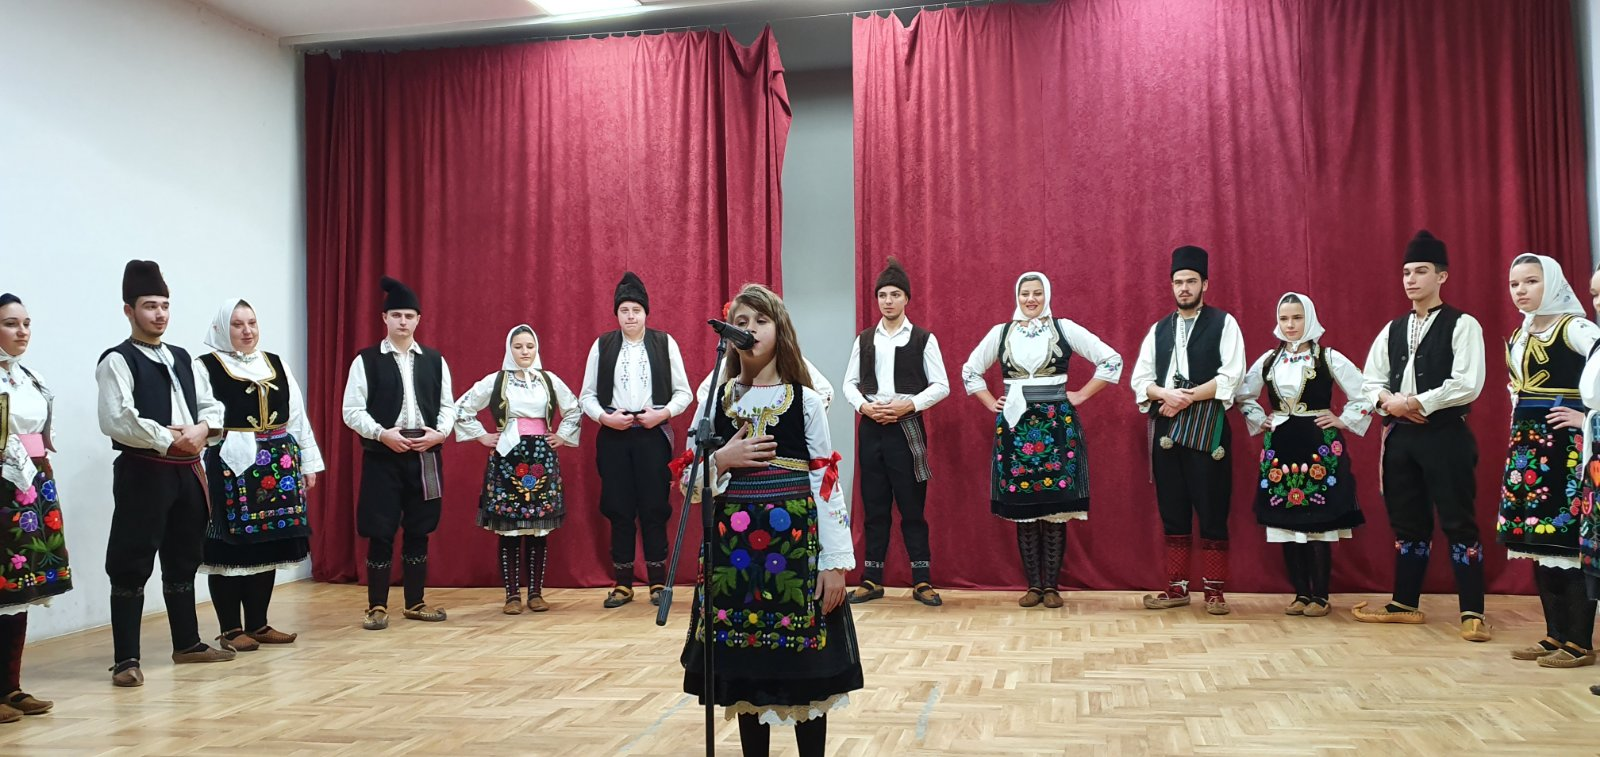 Božićni festival, foto: M.M.